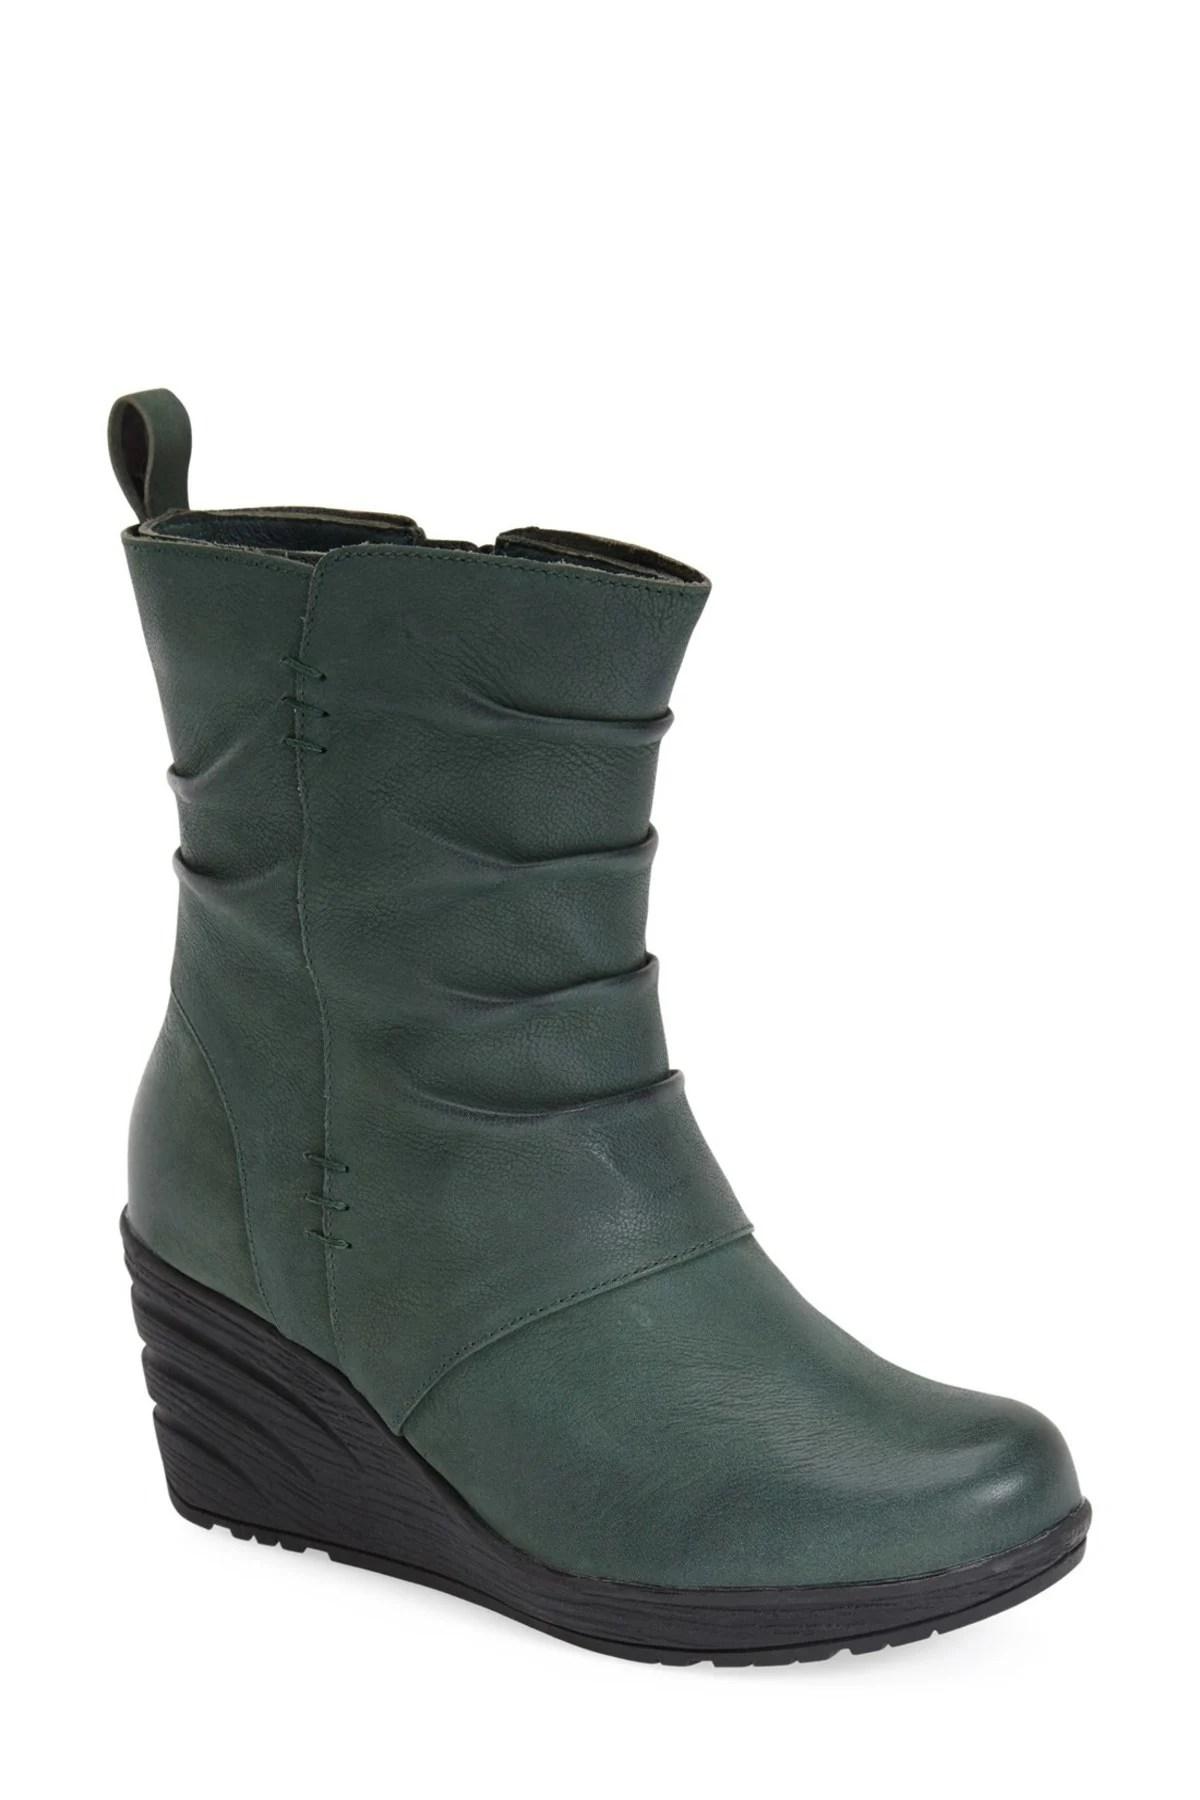 Lyst Miz Mooz Tora Wedge Boot In Green